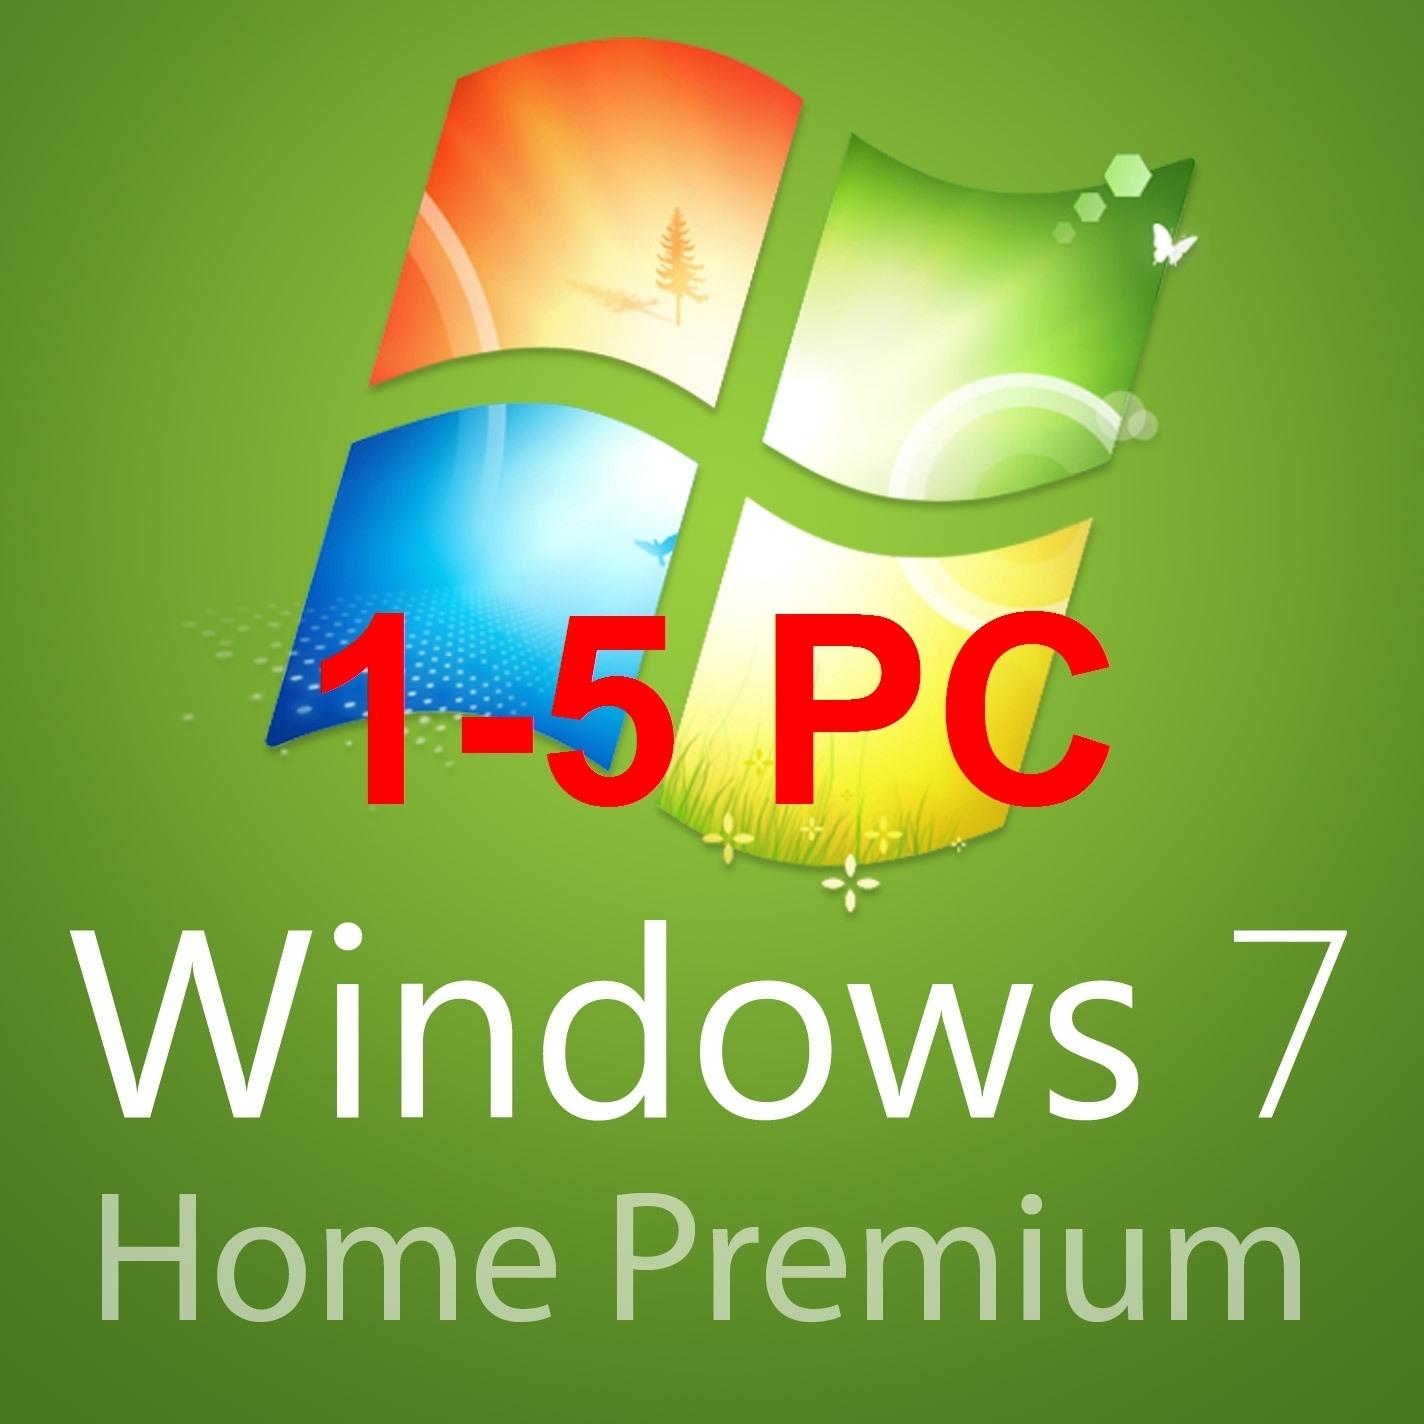 1-5pc Windows 7 home premium 32/64 BITS- OEM and 50 similar items